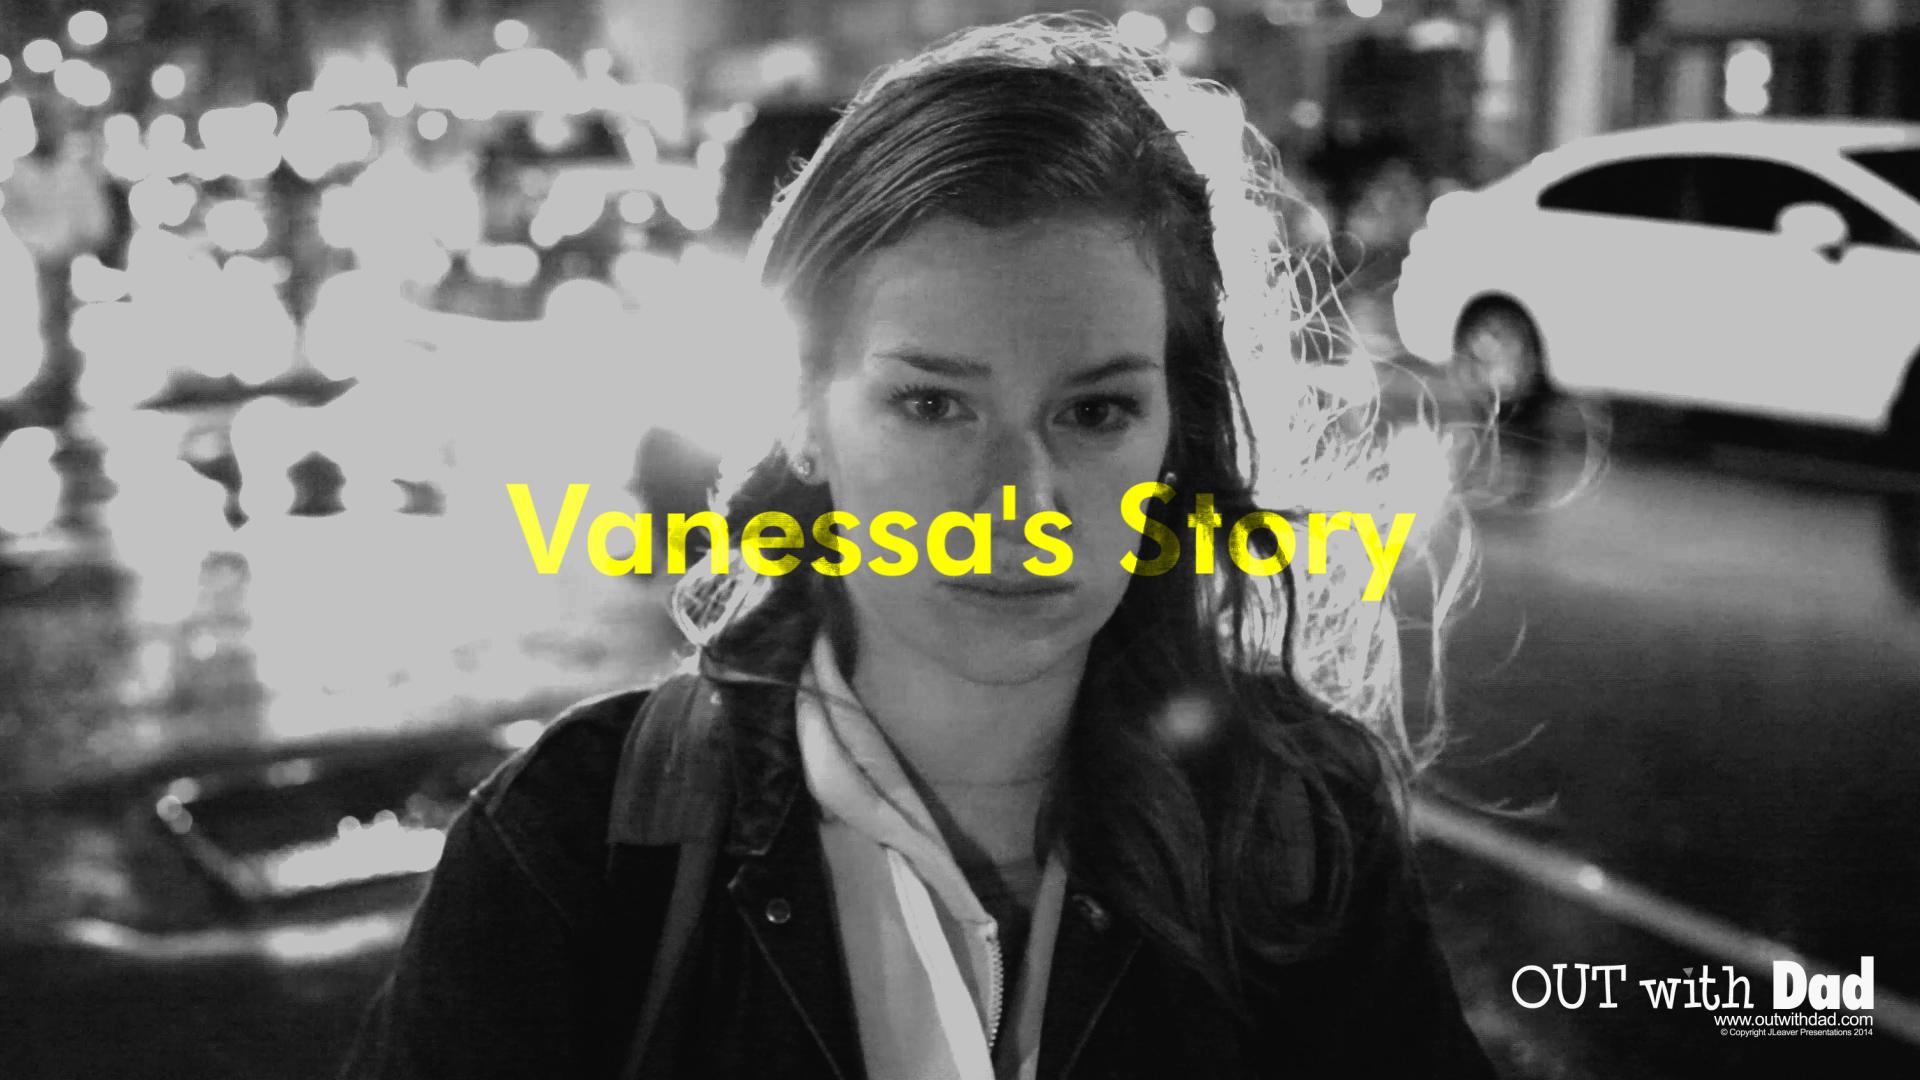 Vanessa's Story Trailer